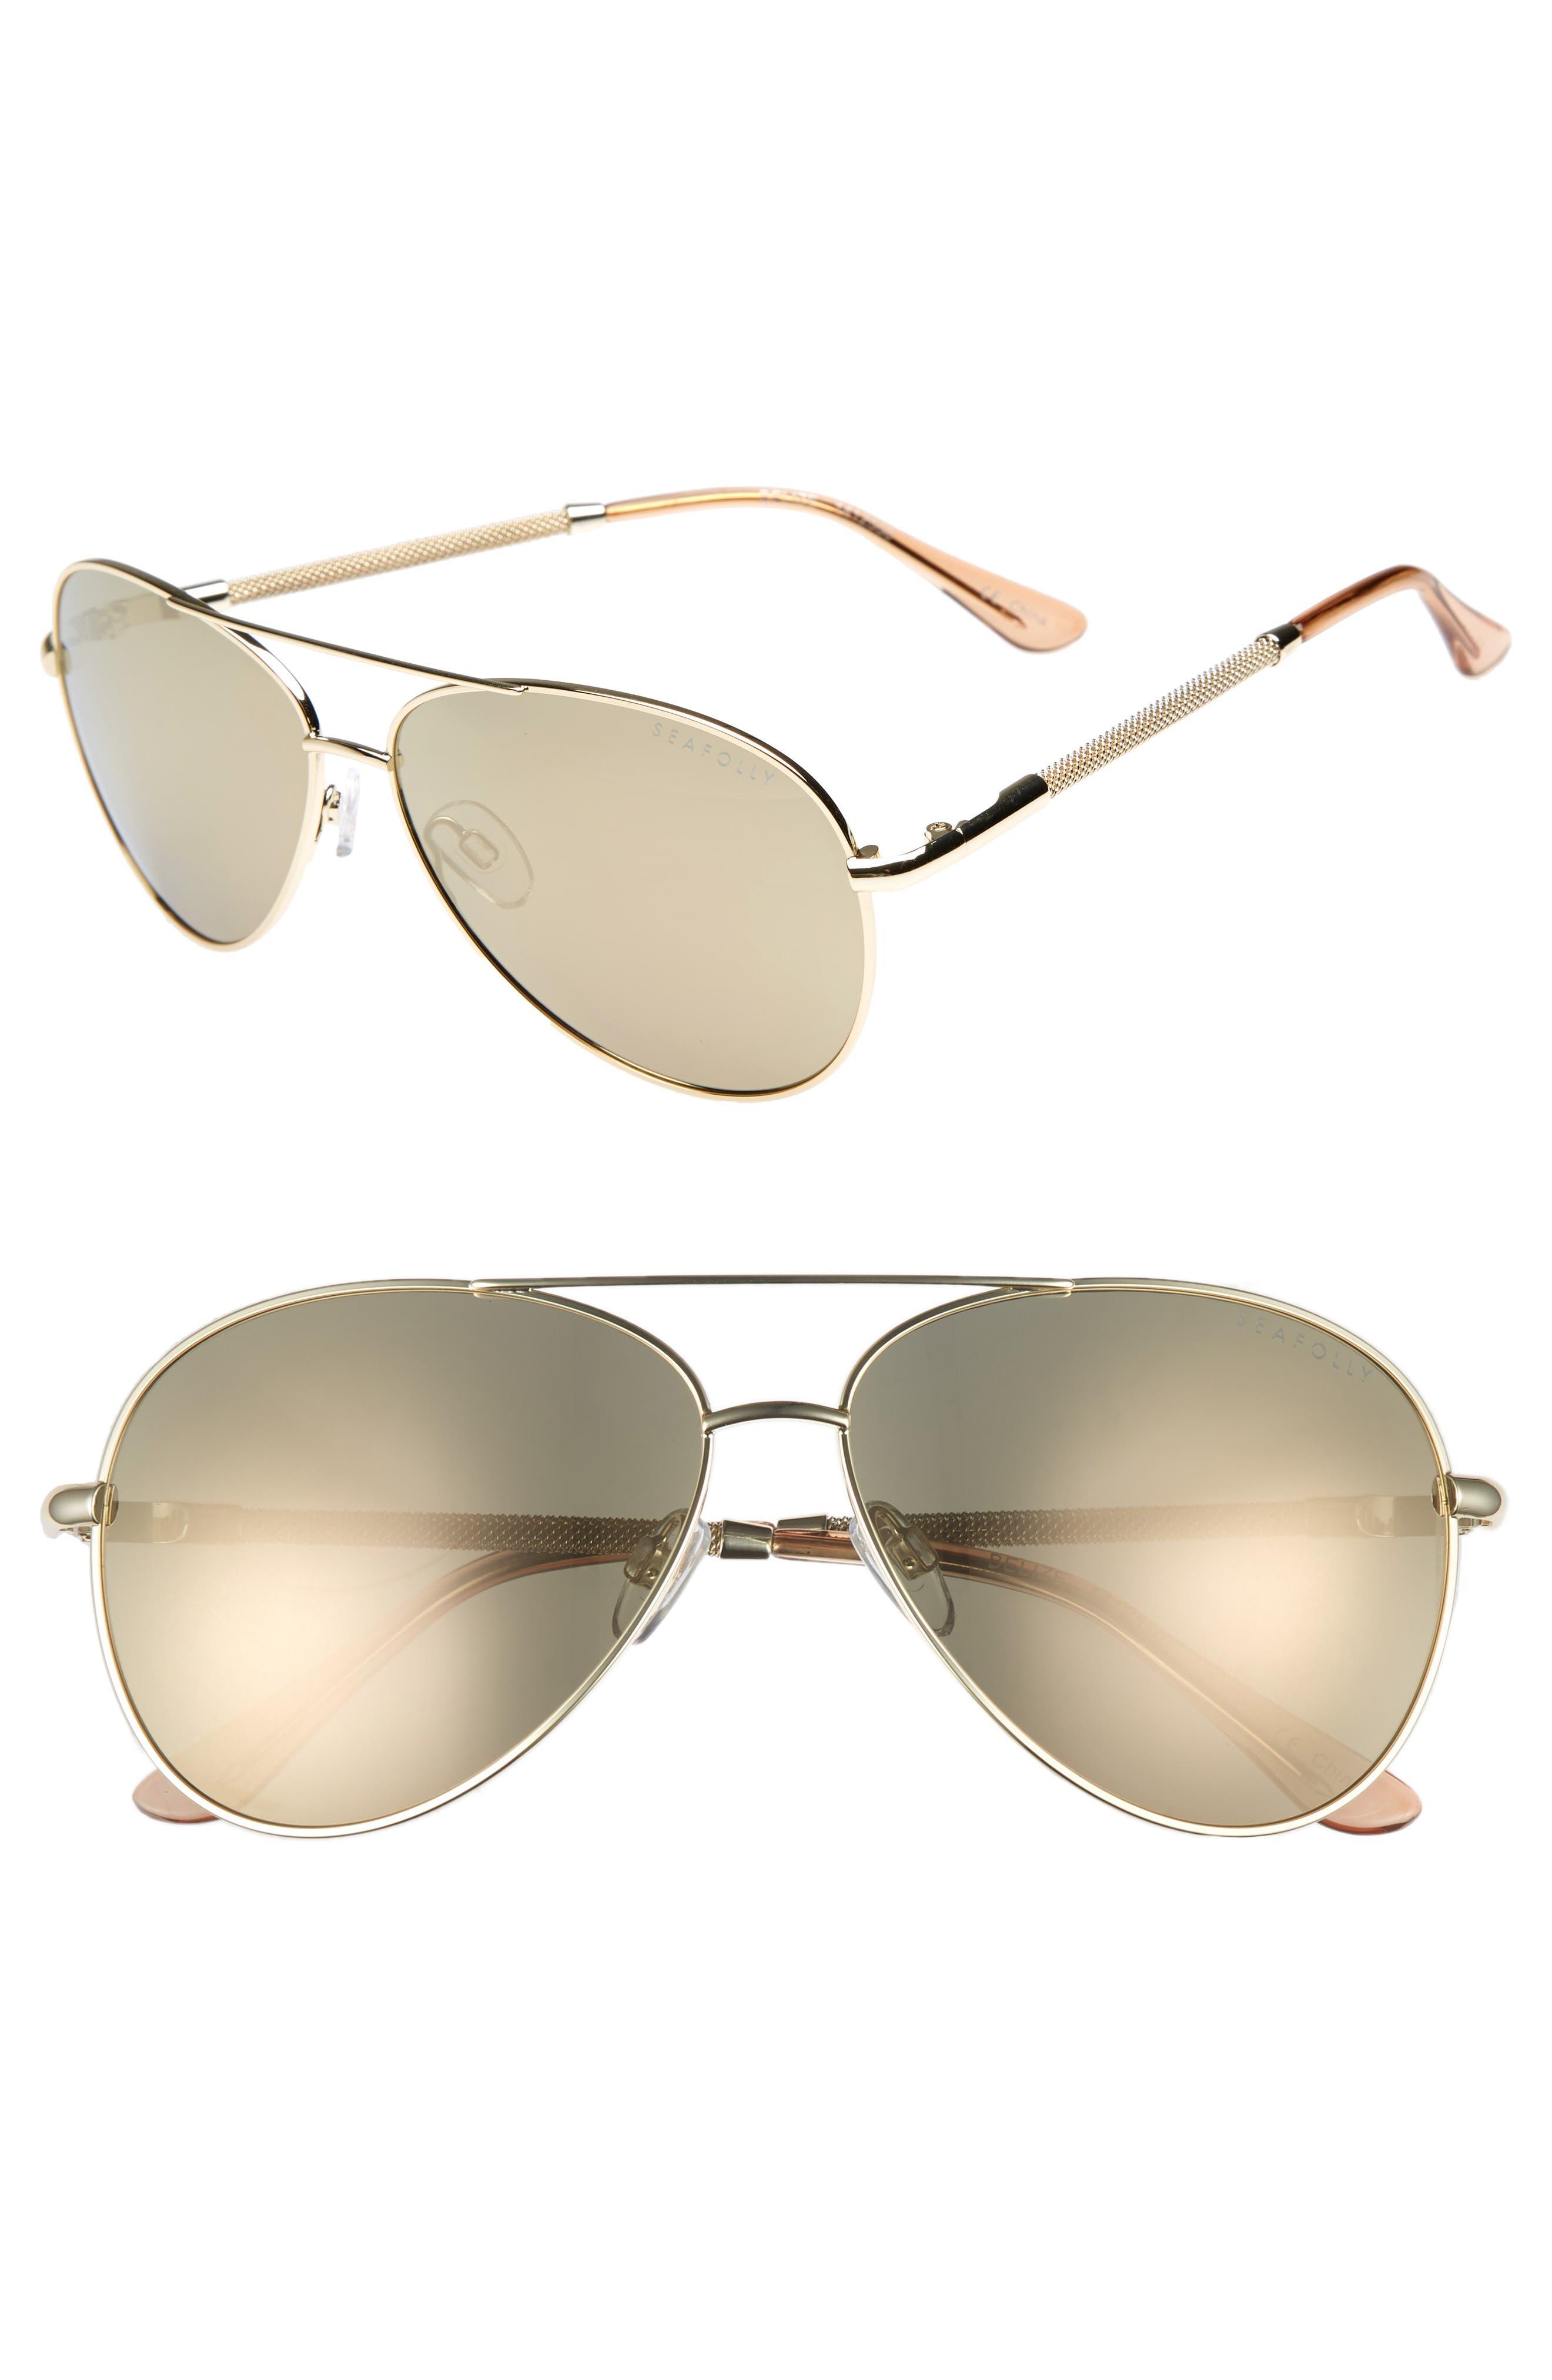 Belize 59mm Aviator Sunglasses,                             Main thumbnail 1, color,